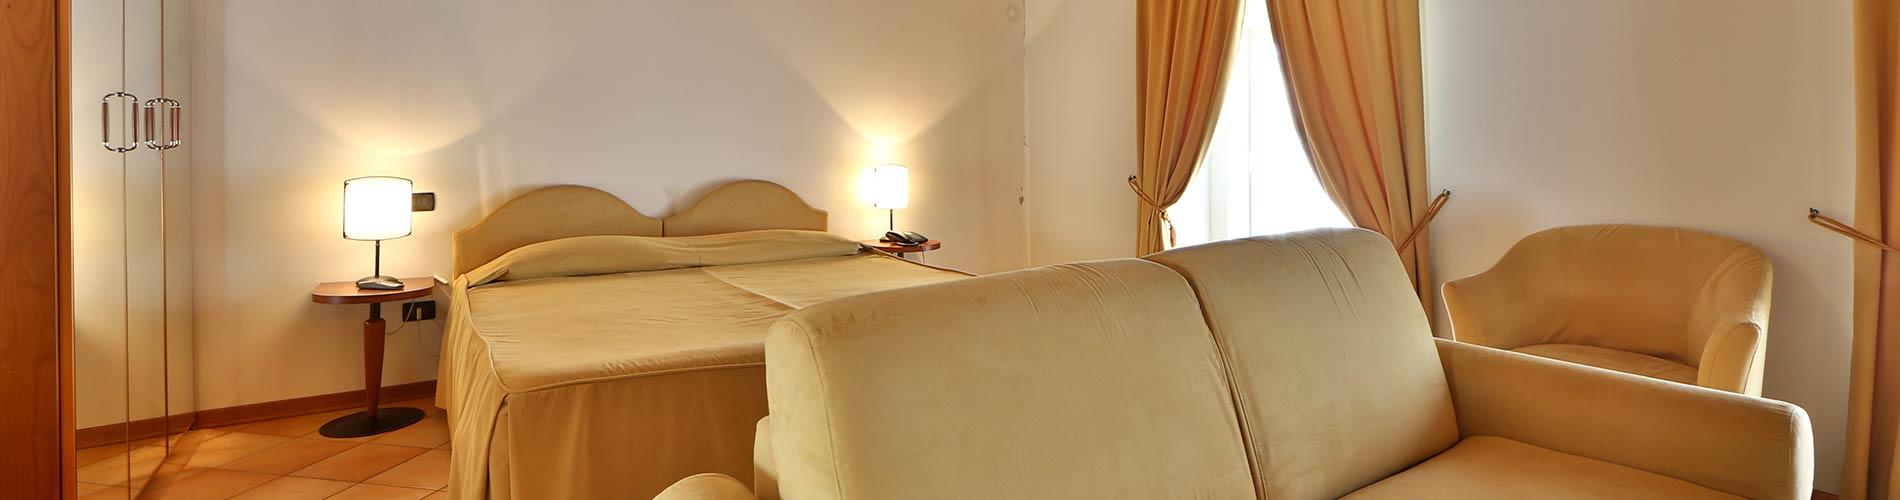 Residence-San-Giusto-Trieste-h1